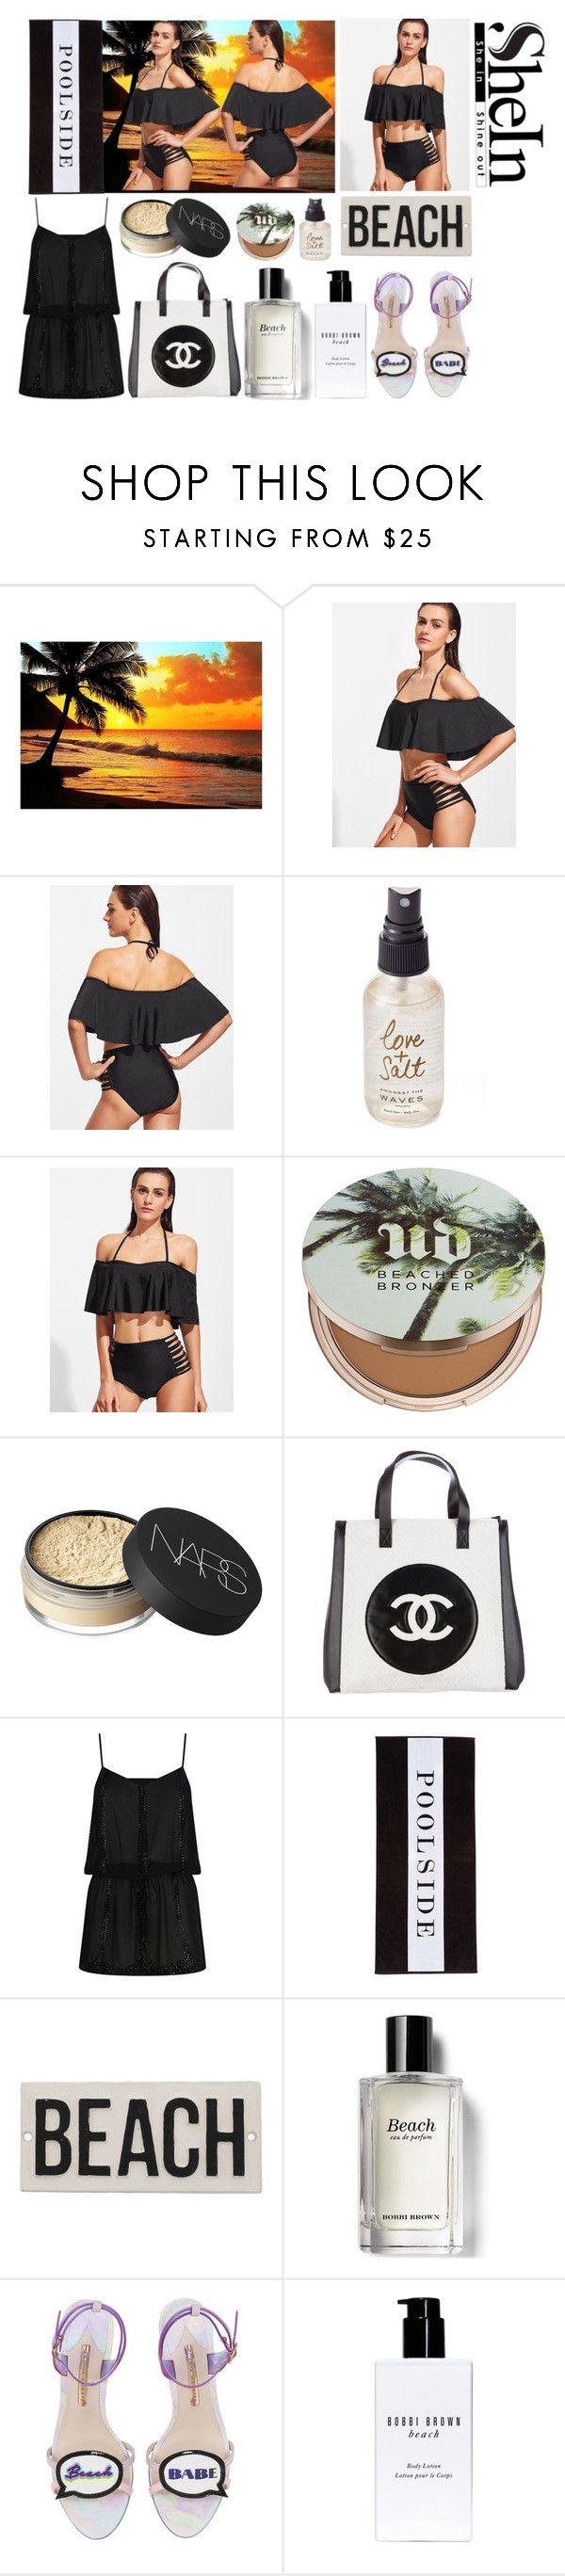 """Black Halter Ruffle Ladder Cutout Bikini Set"" by igiulia on Polyvore featuring Olivine, Urban Decay, NARS Cosmetics, Chanel, ELIZABETH HURLEY beach, Chance, HomArt, Bobbi Brown Cosmetics and Sophia Webster"